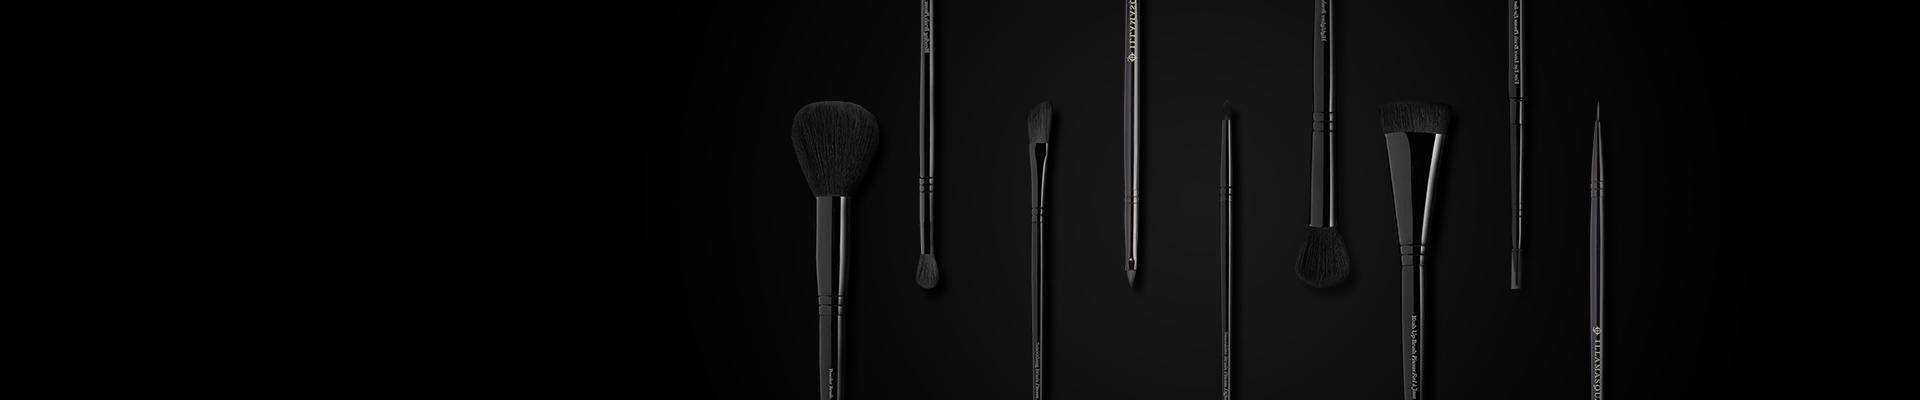 SYOS brush